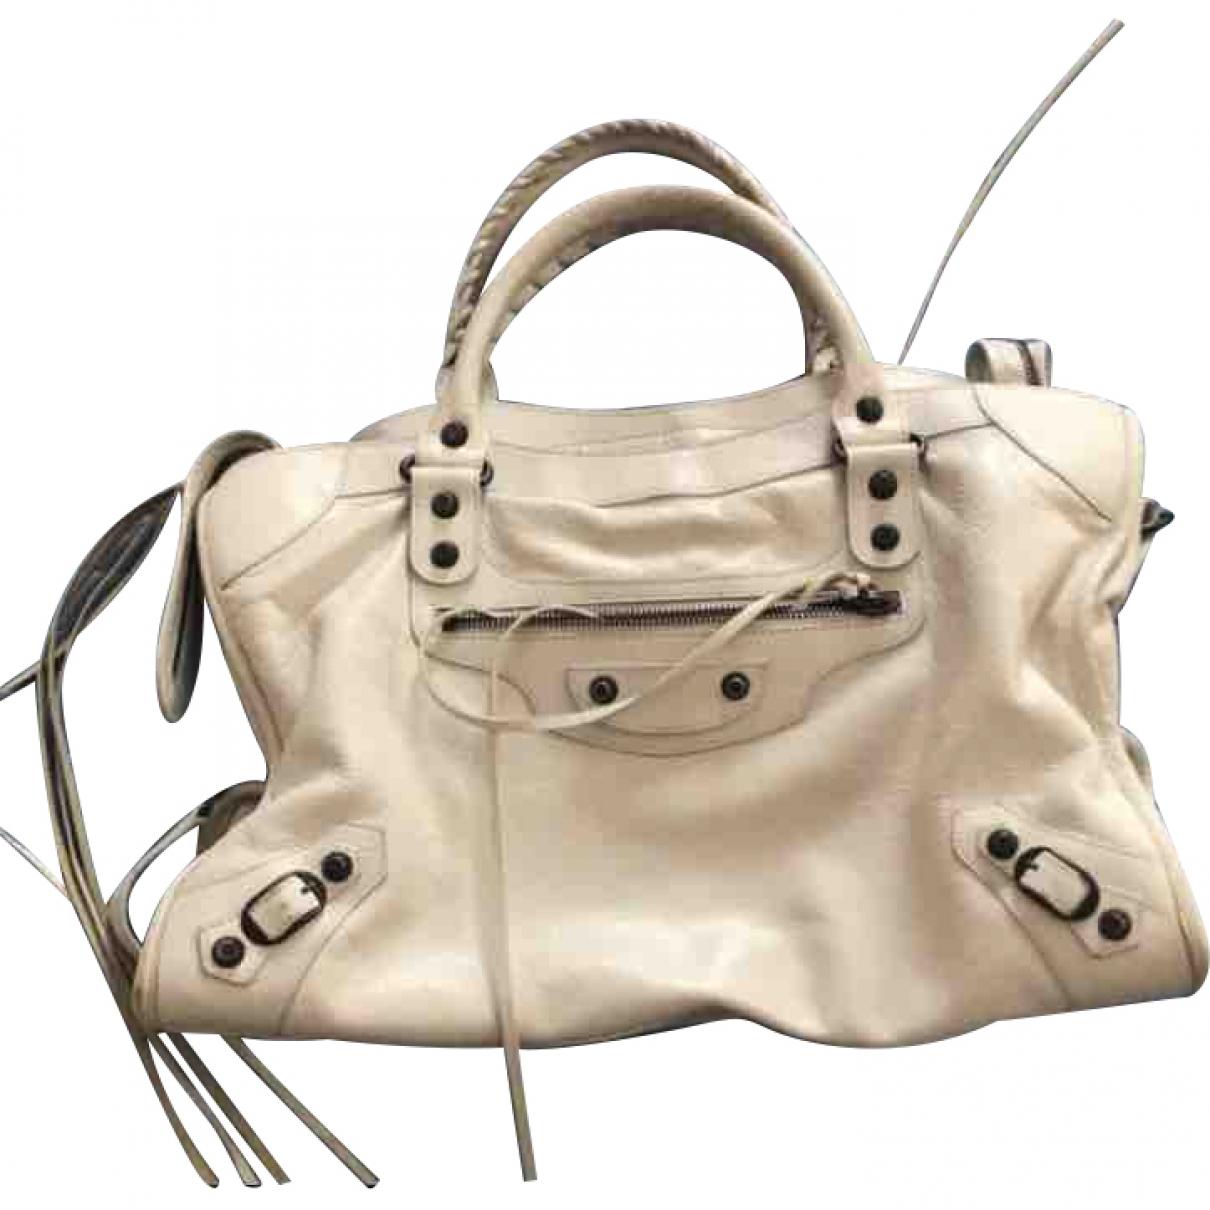 Balenciaga City Handtasche in  Weiss Leder